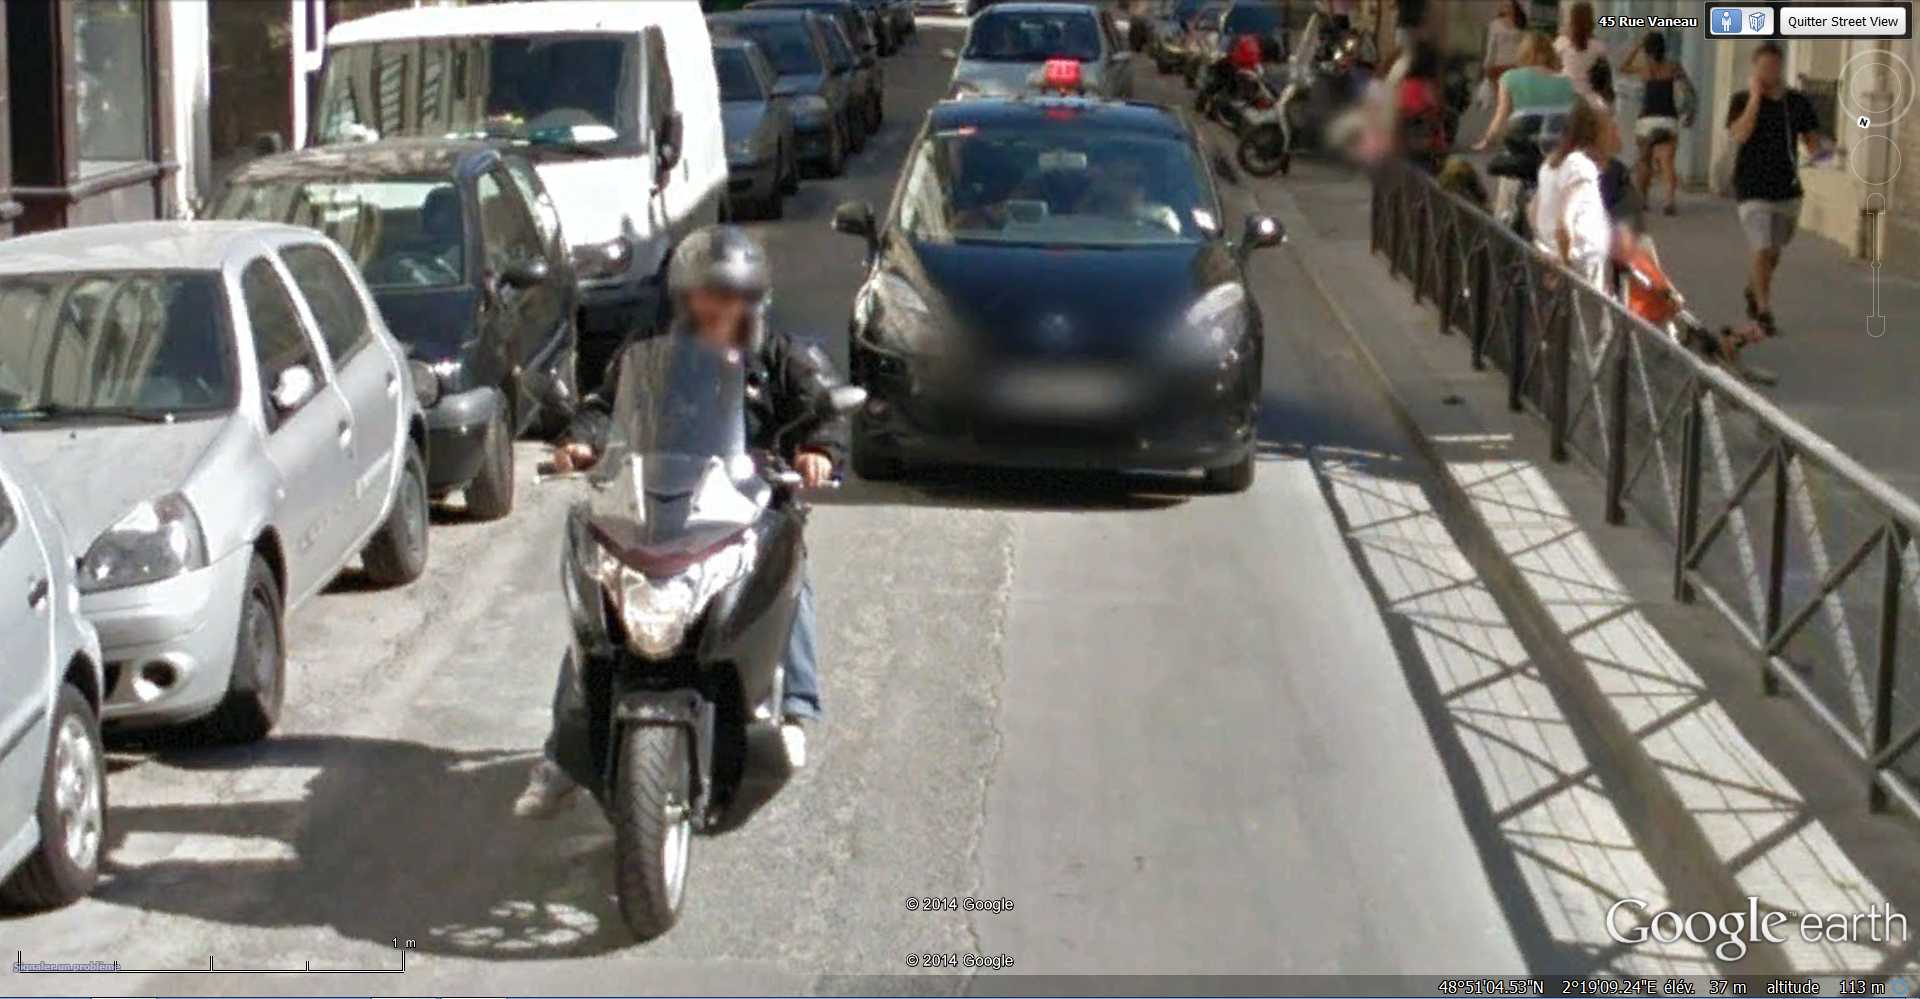 STREET VIEW : Chute de moto - rue Vaneau - Paris - France  2014-316